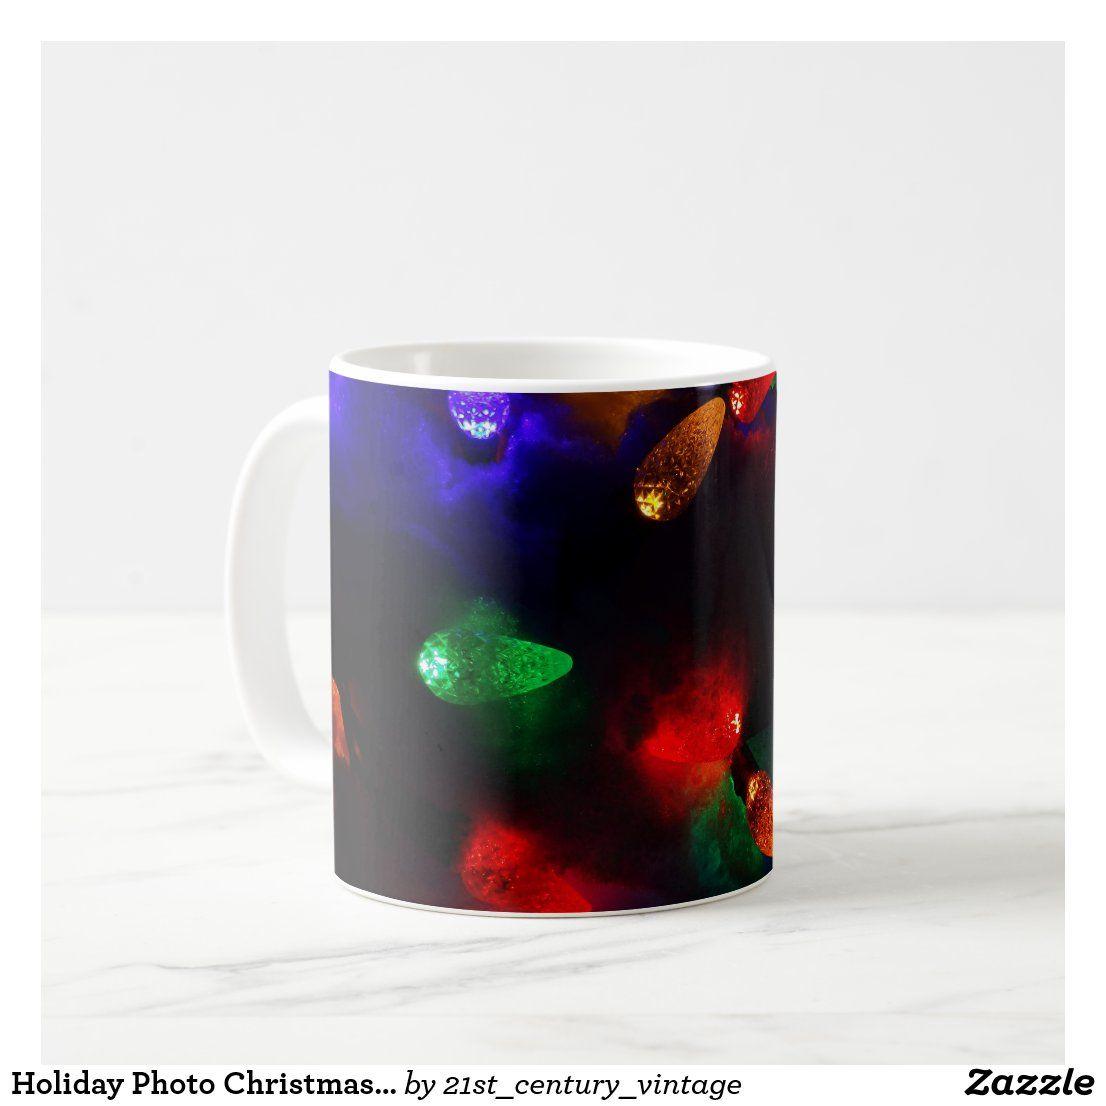 Holiday Photo Christmas Fairy Lights On Real Snow Coffee Mug Zazzle Com In 2021 Christmas Fairy Lights Christmas Fairy Fairy Lights Holiday christmas mug full hd wallpaper